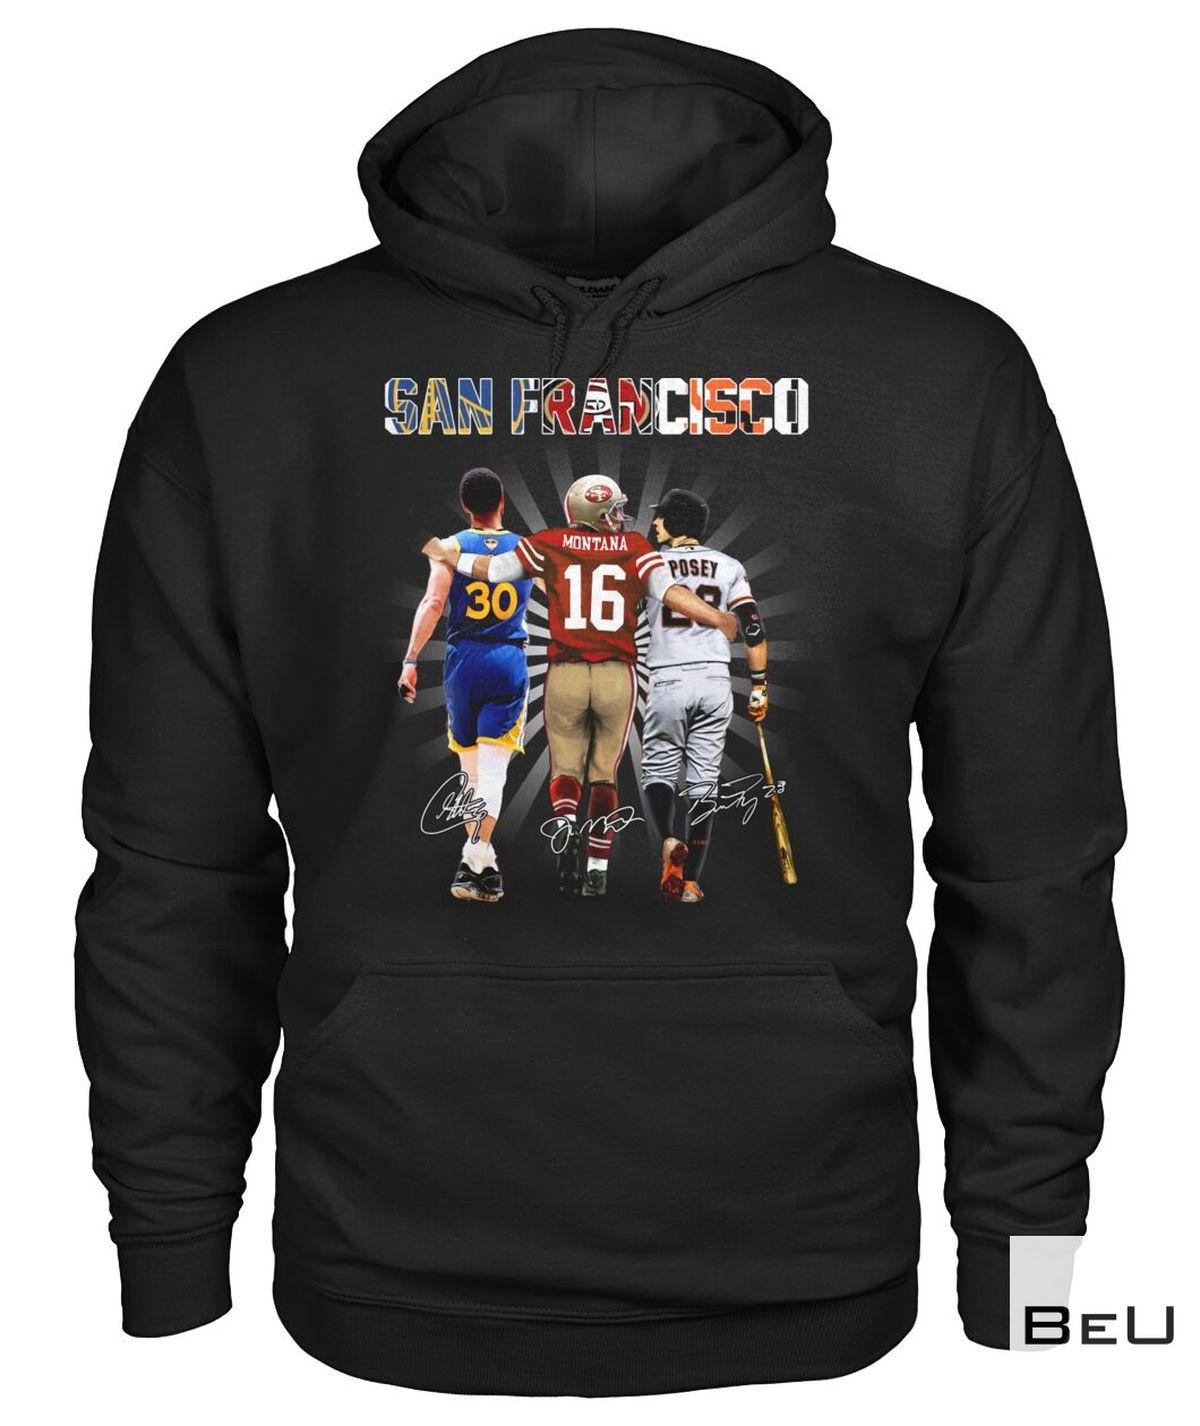 San Francisco Montana Shirt z